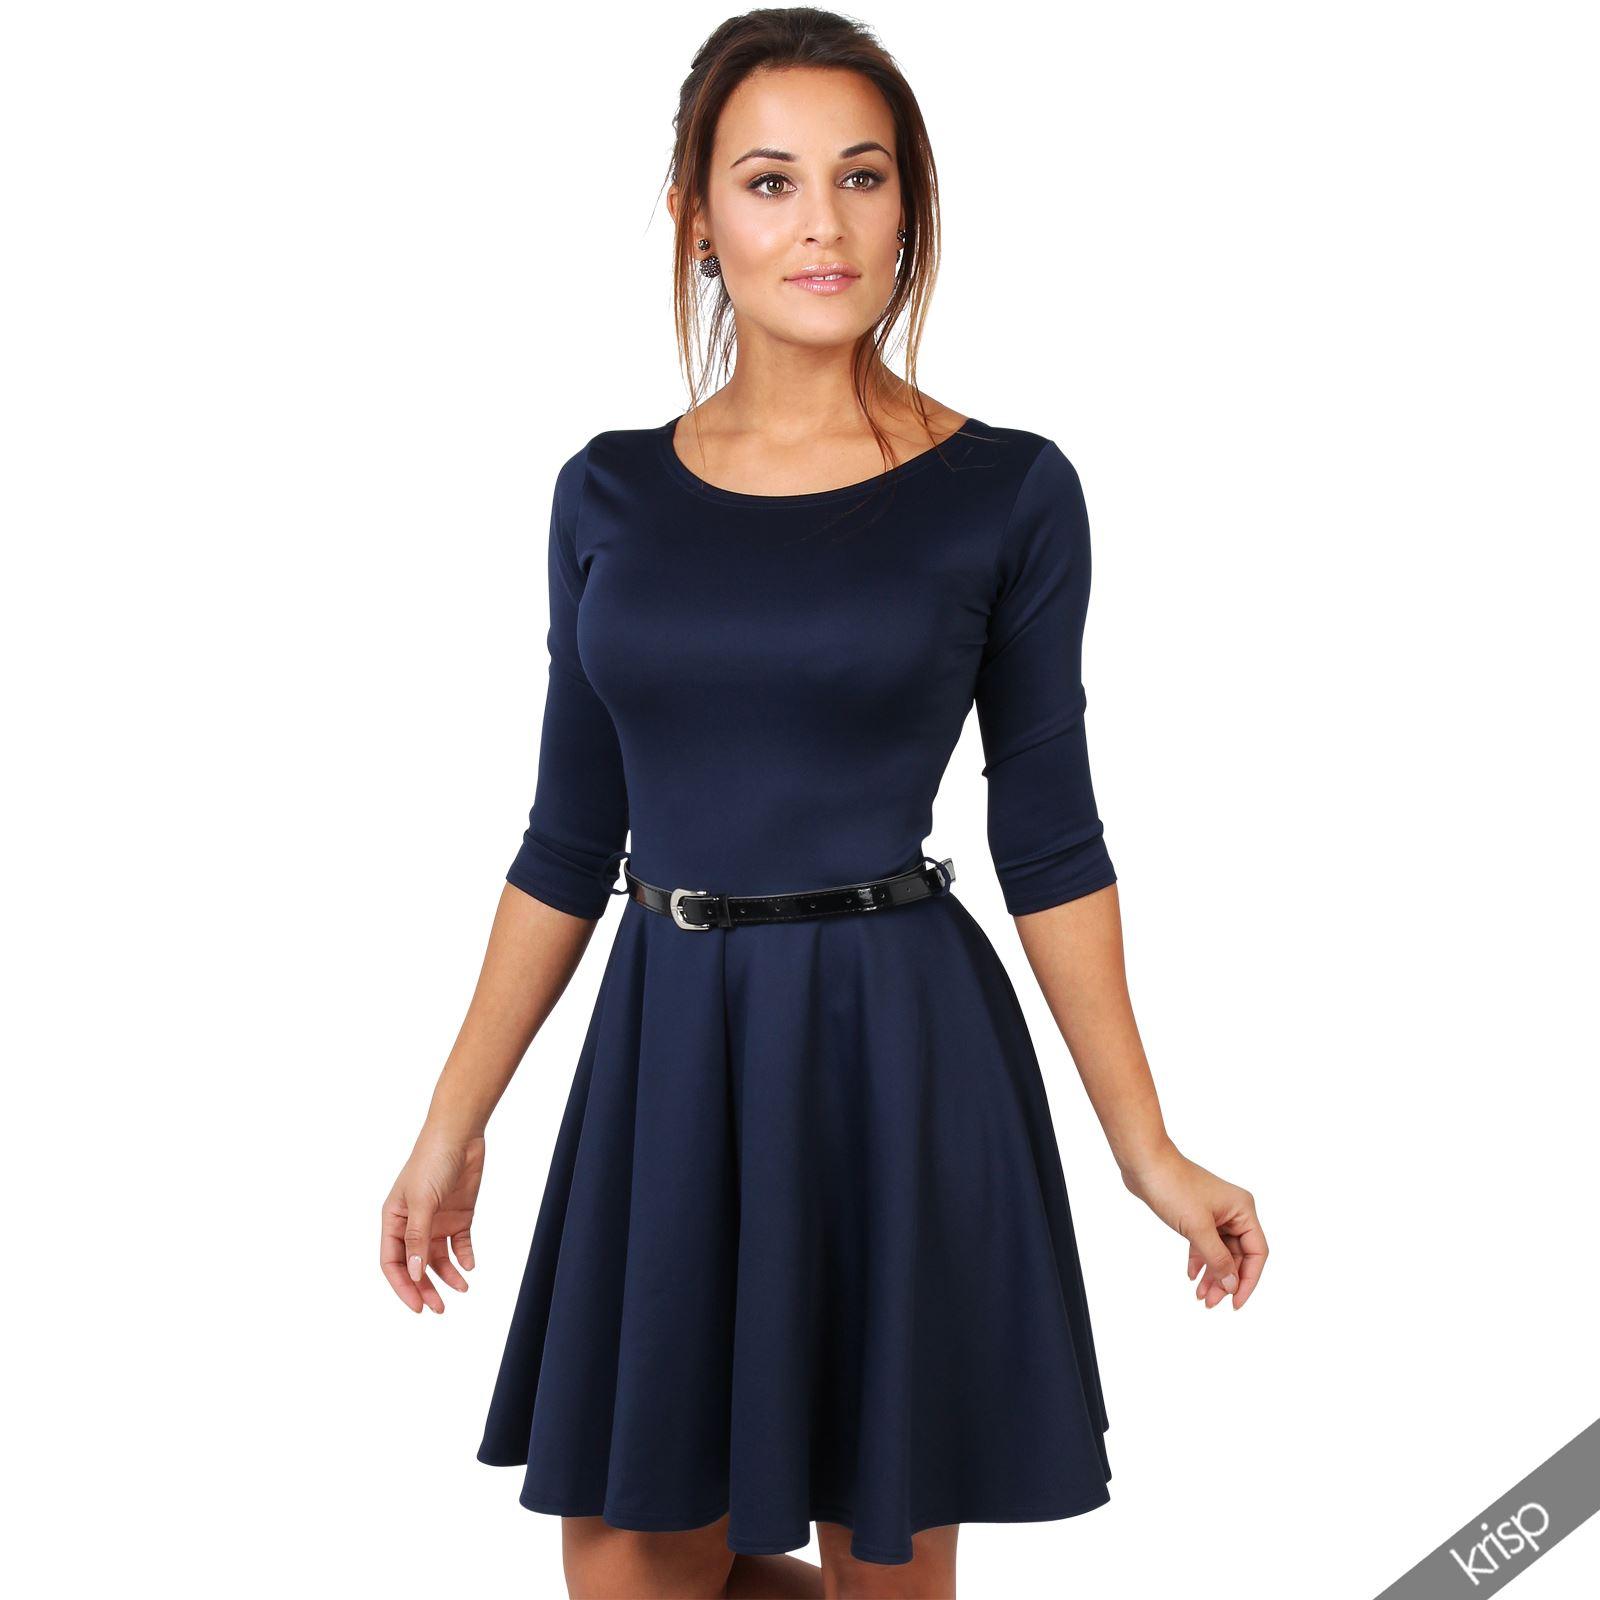 Blue Old Fashioned Dress Best Brand